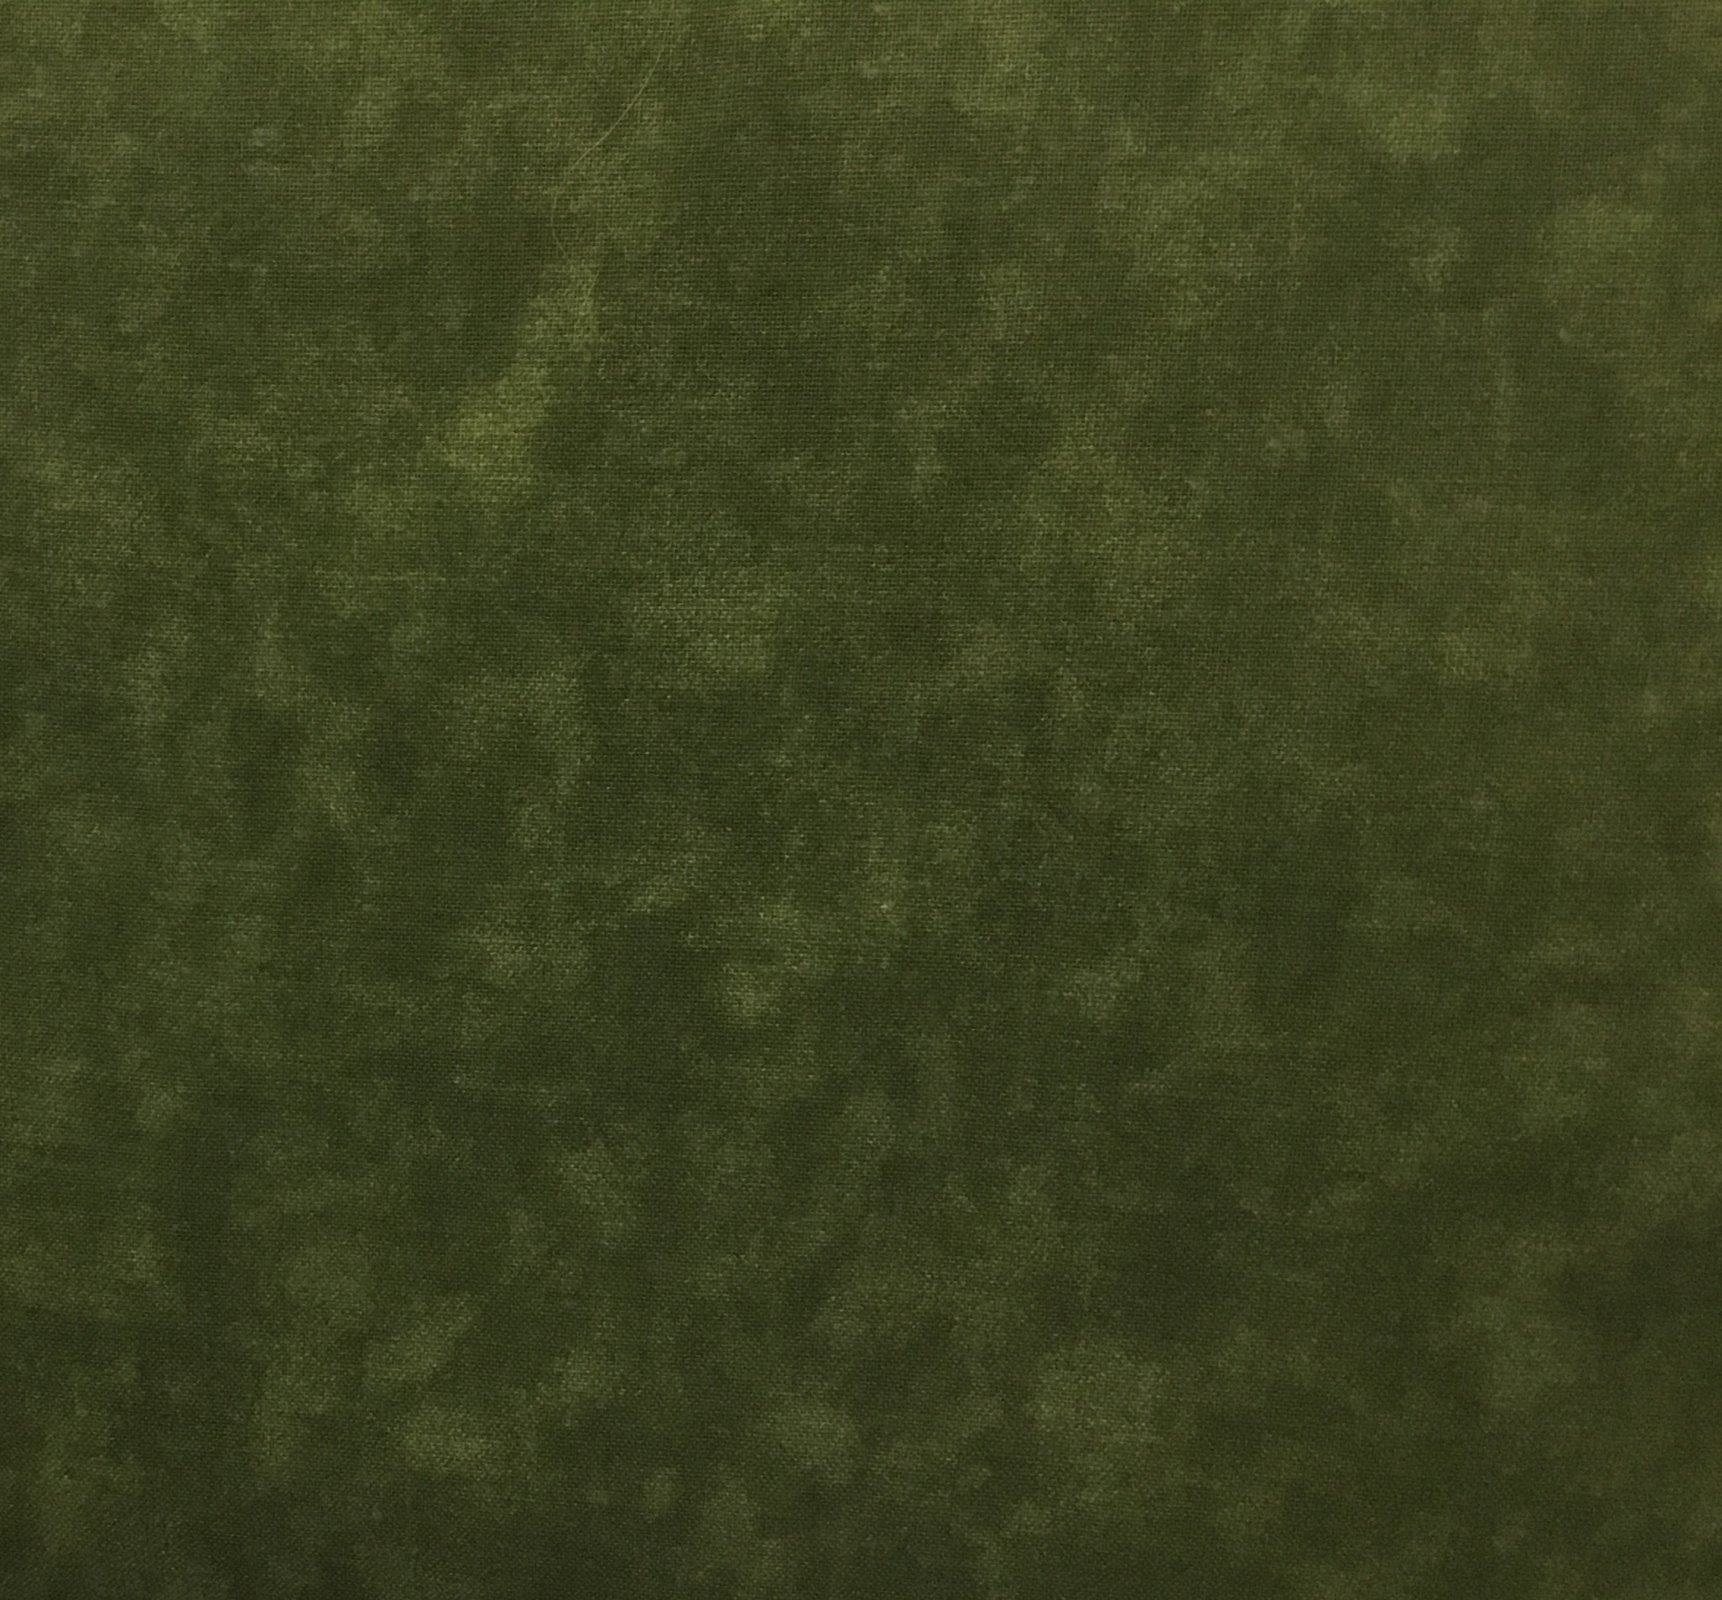 108 backing, olive green